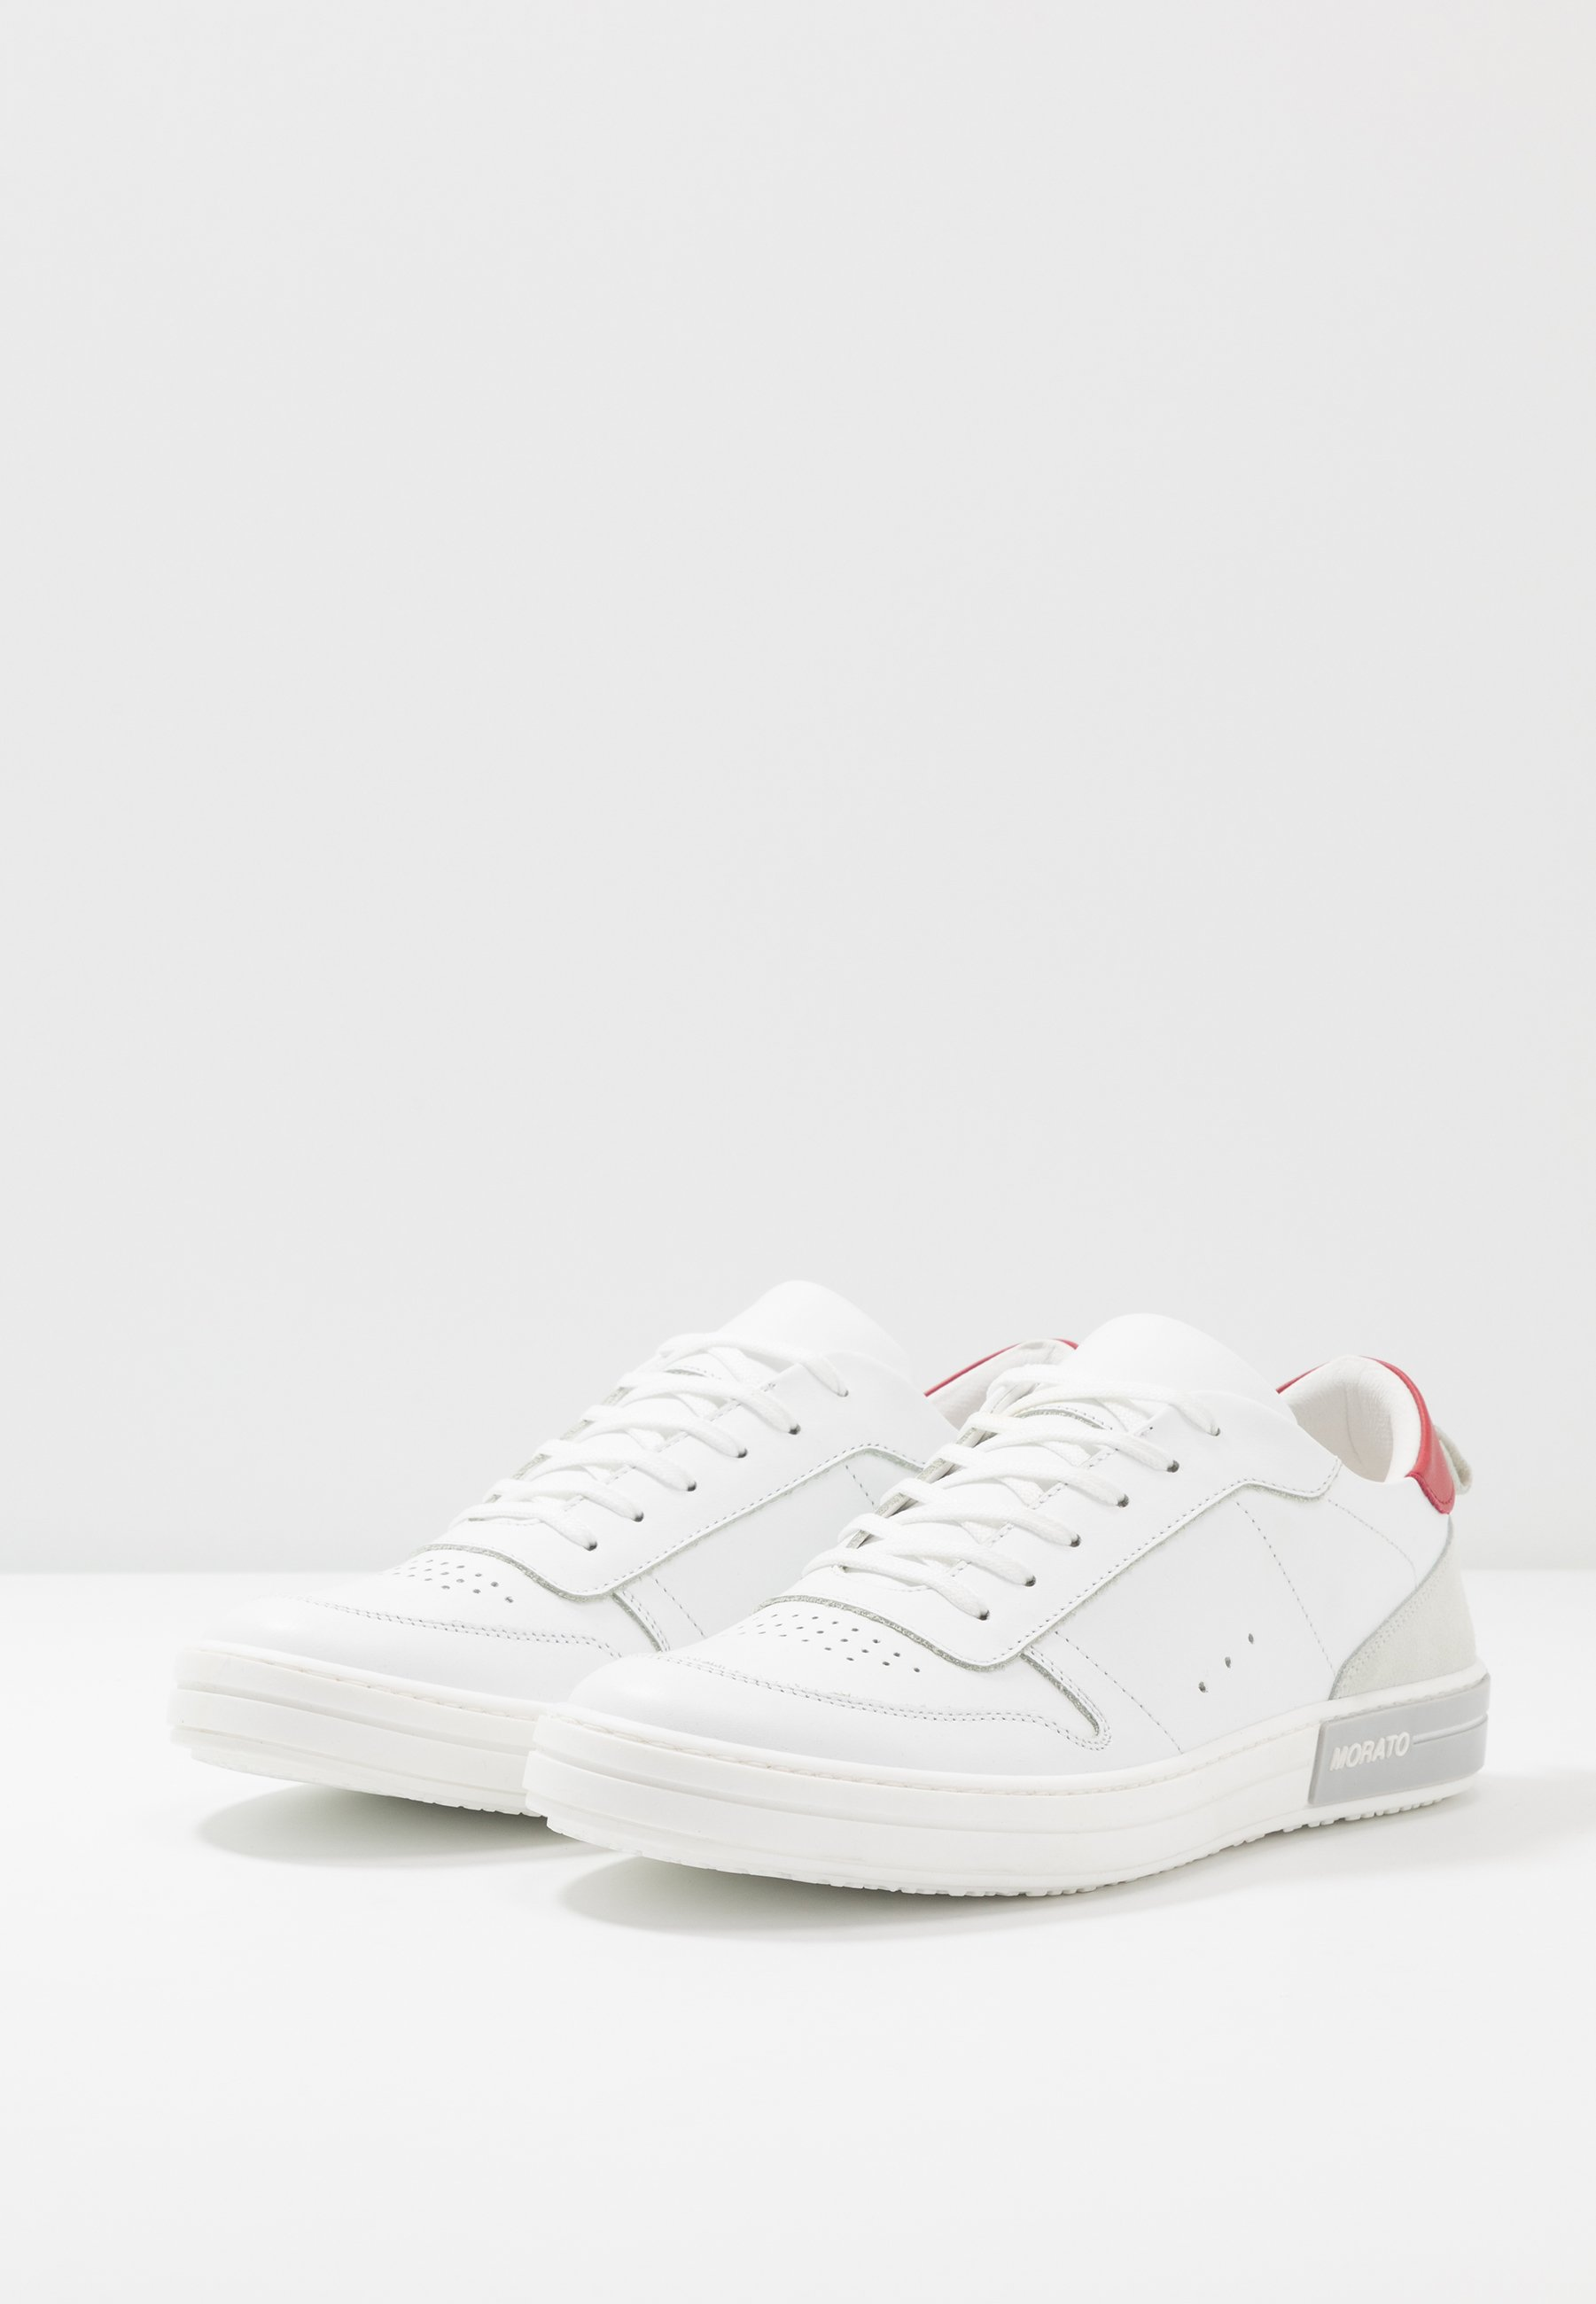 Antony Morato DRAKE - Sneaker low - white/weiß - Herrenschuhe GsBpQ